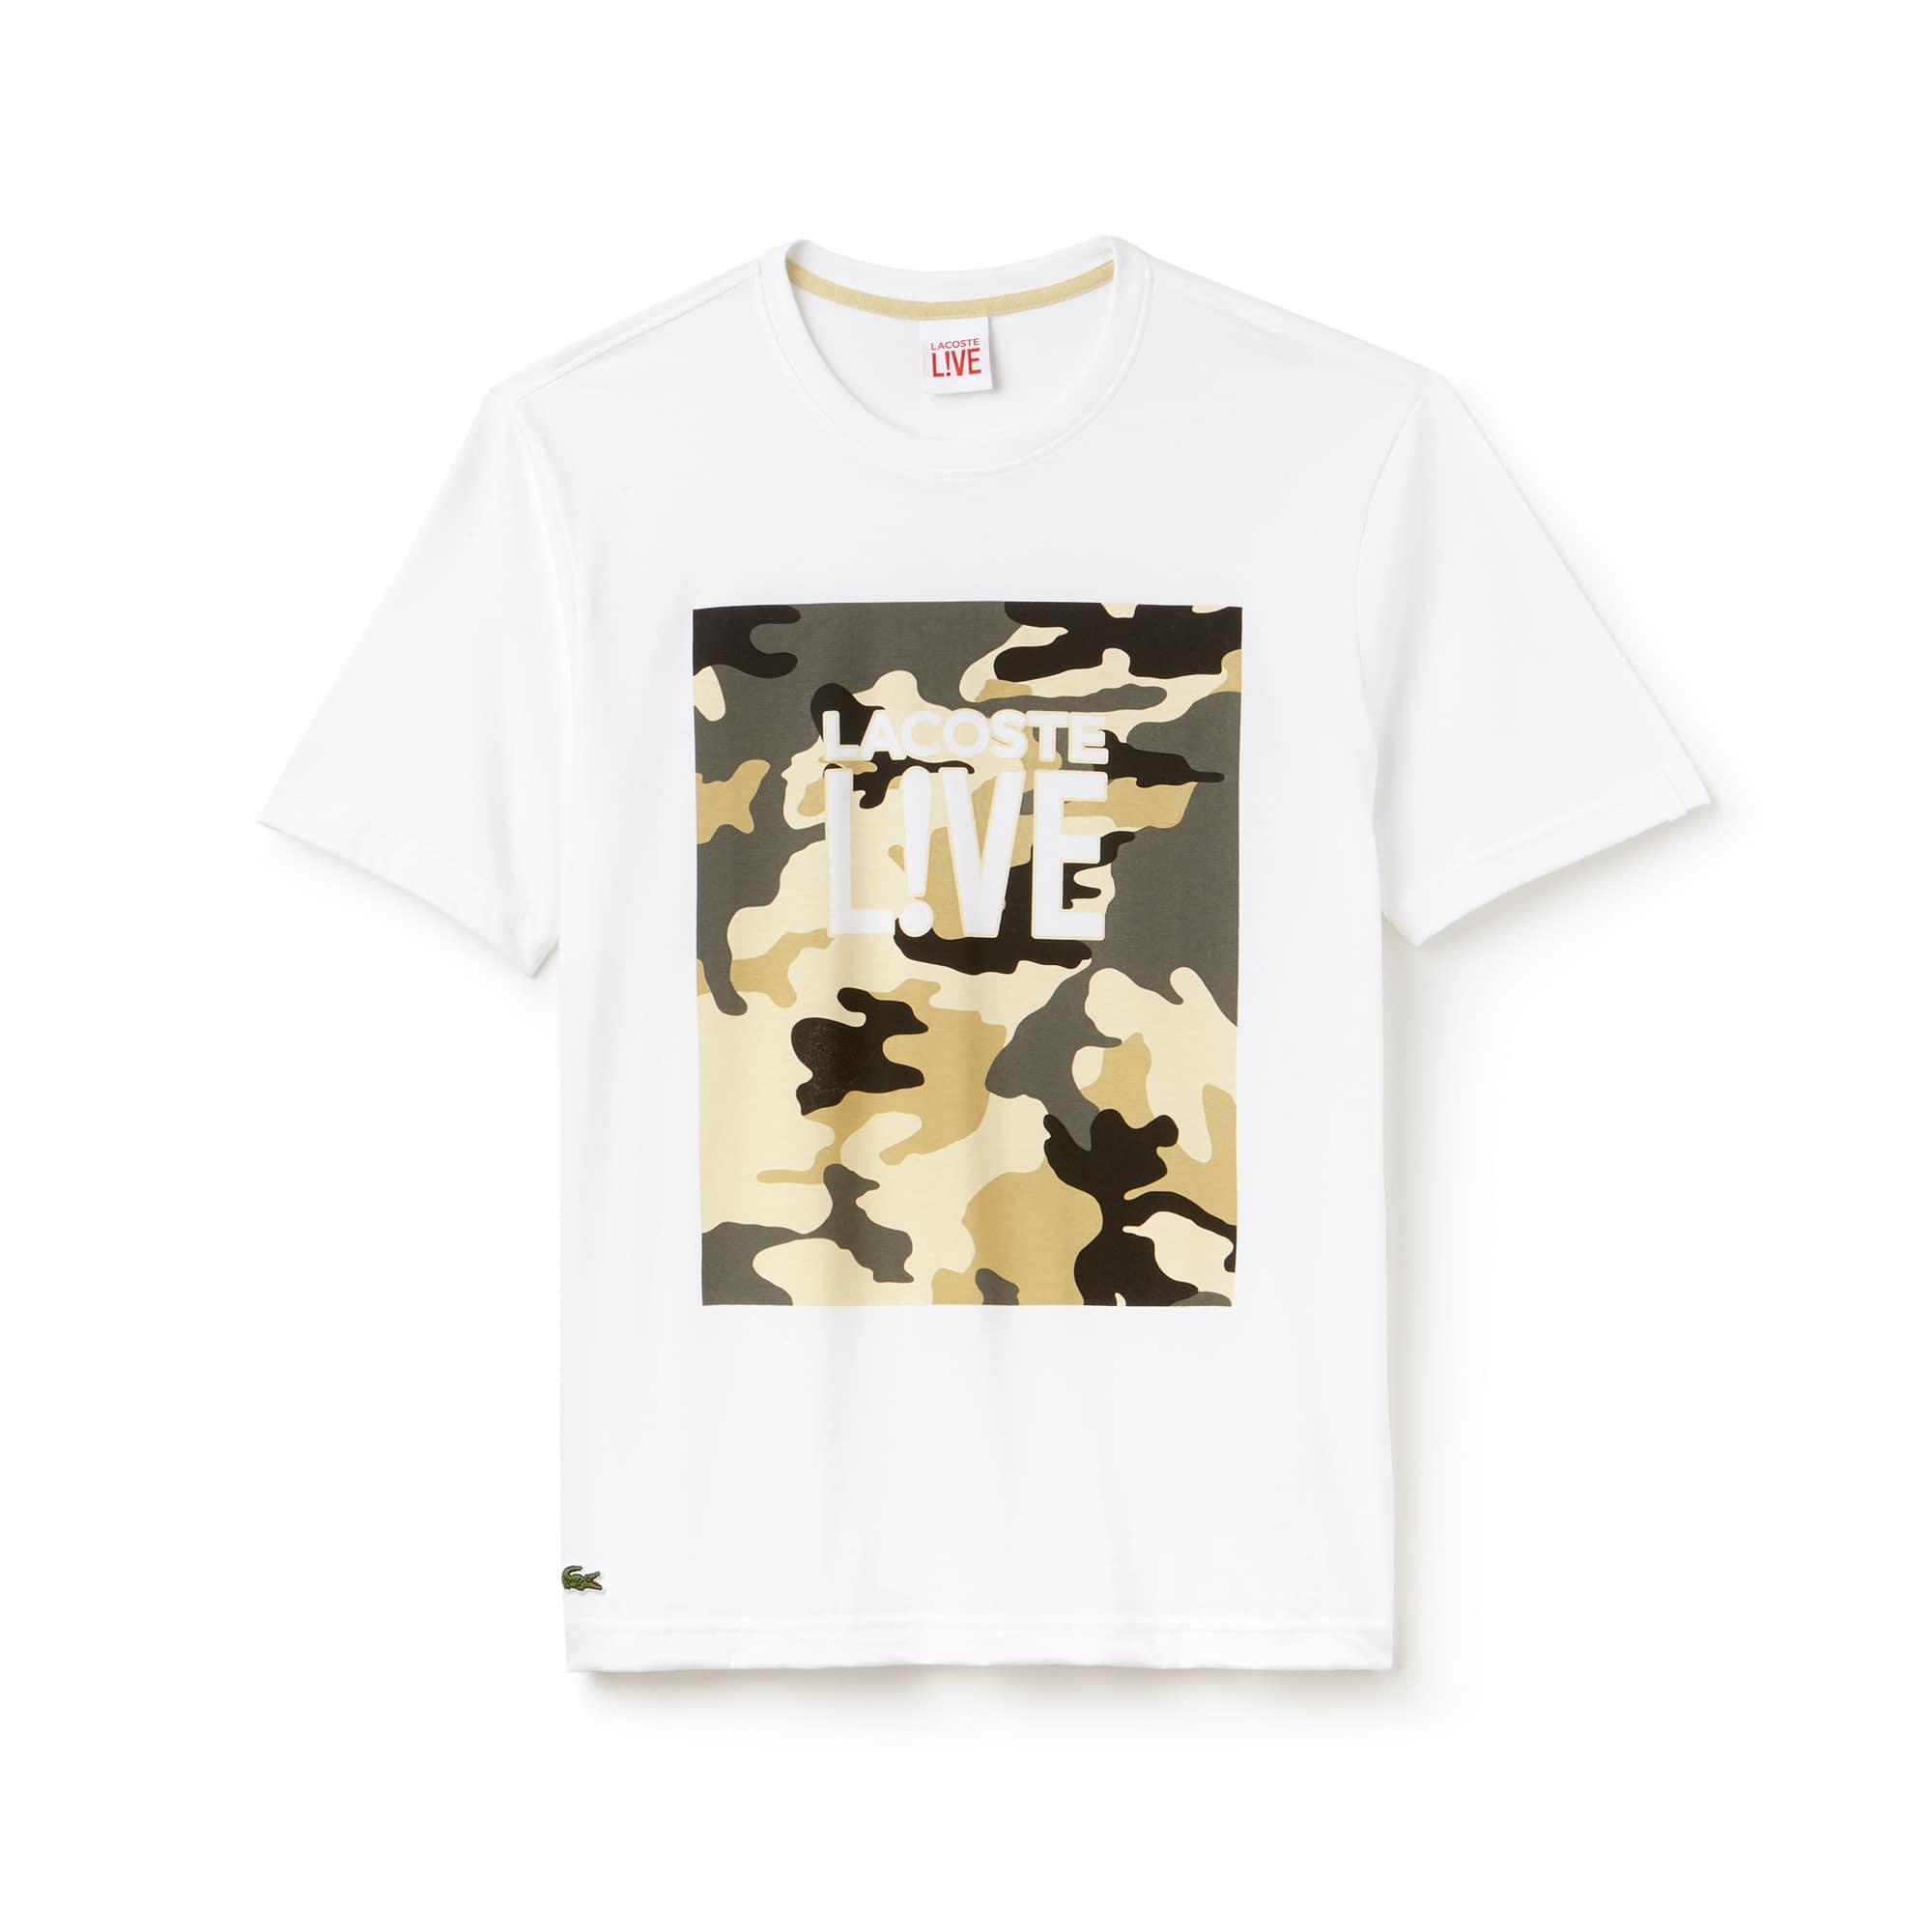 Camiseta Hombre Print Camuflaje Lacoste Live